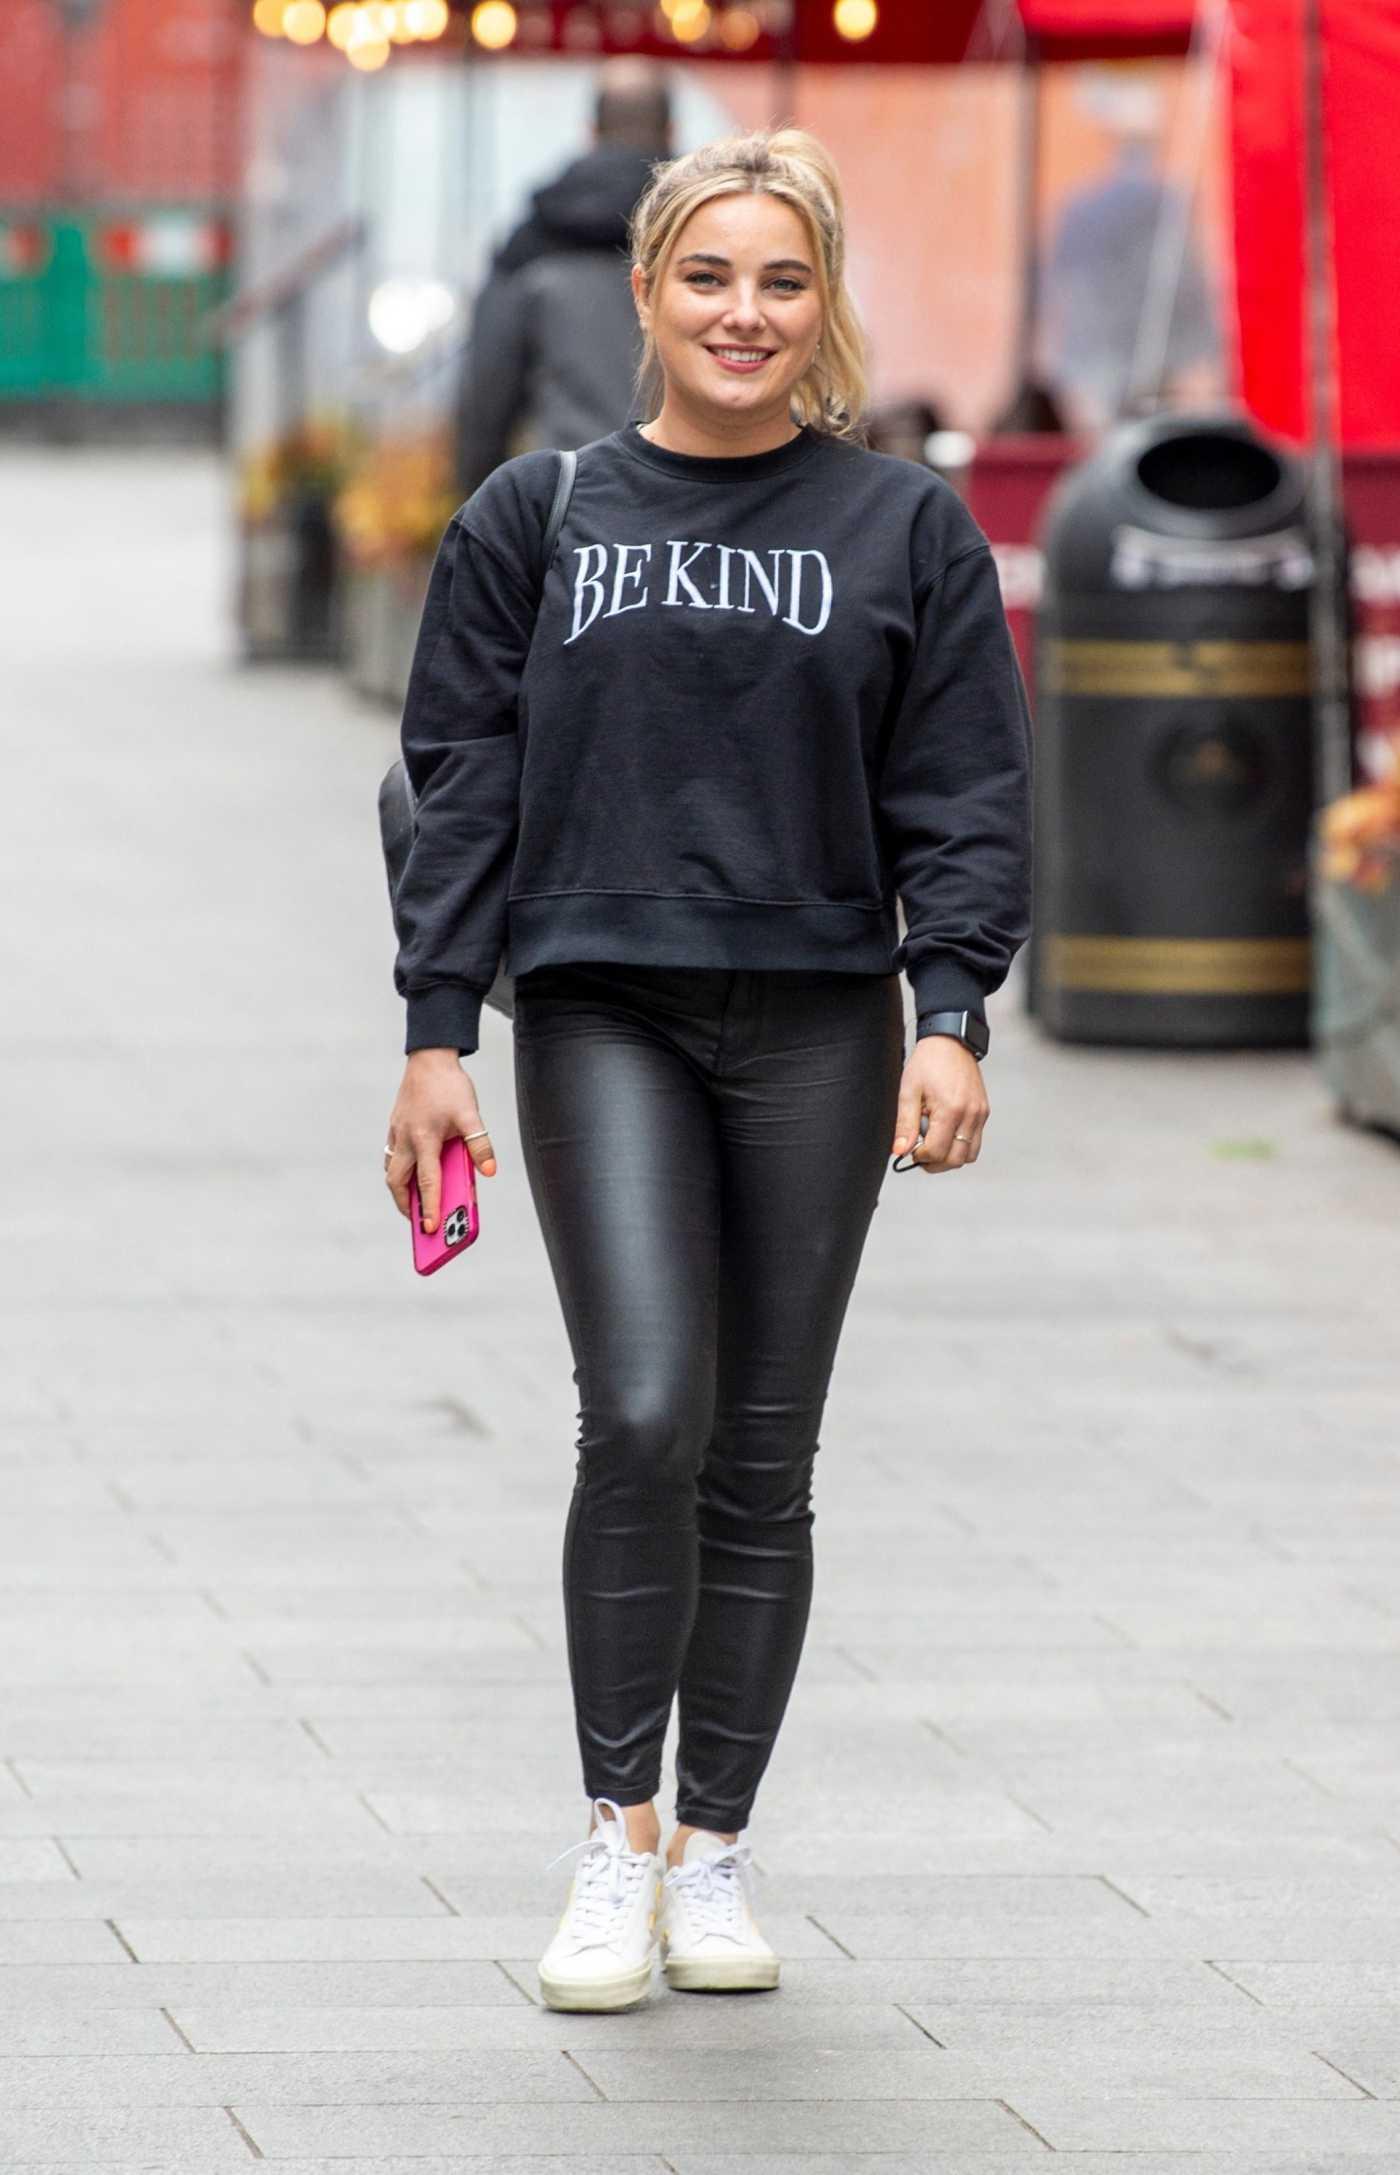 Sian Welby in a Black Sweatshirt Leaves the Global Studios in London 05/14/2021